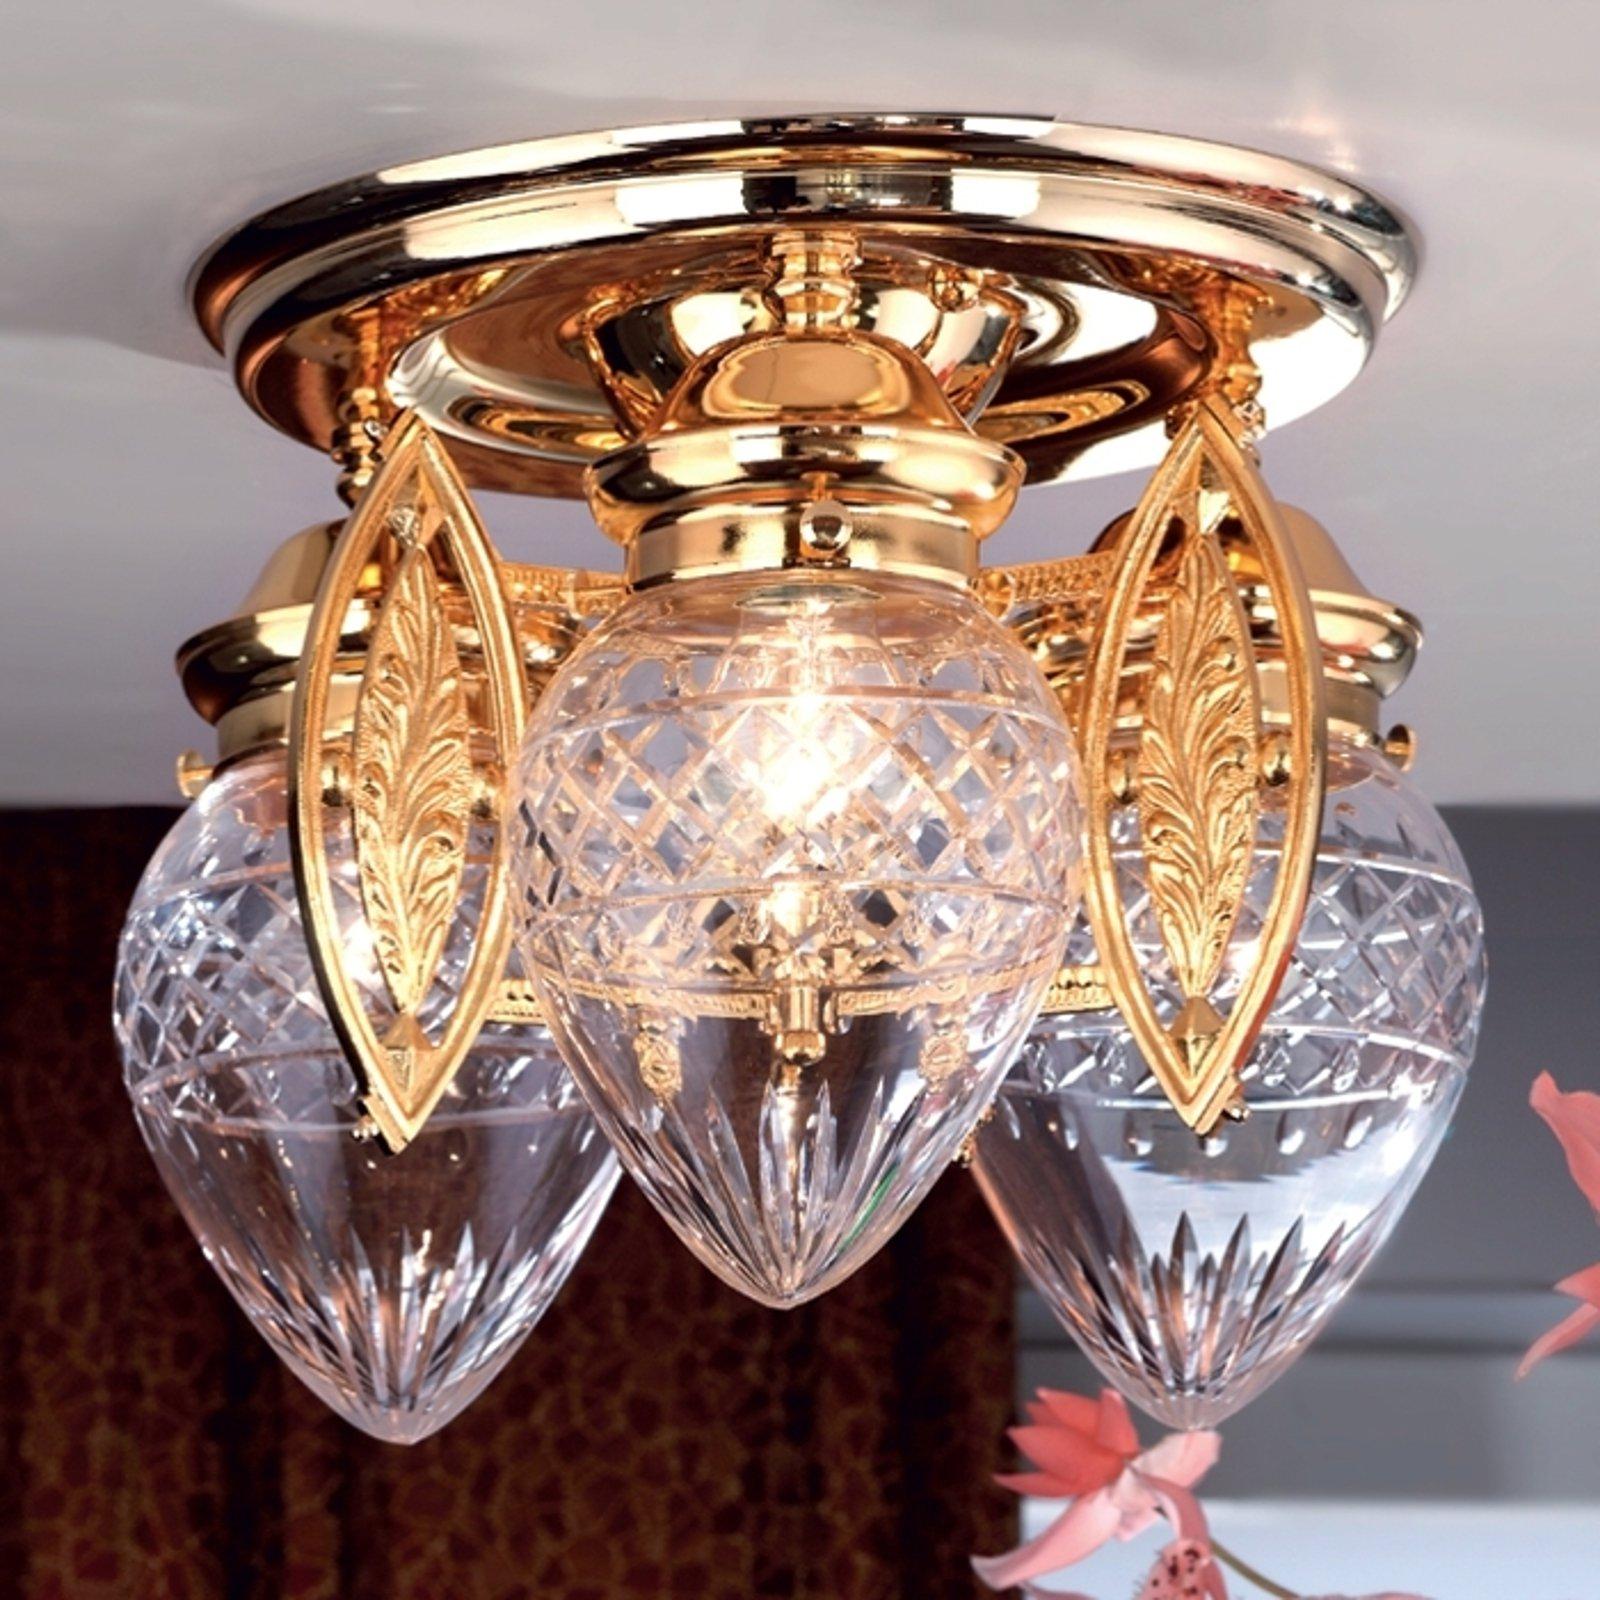 Strålende BUDAPEST taklampe med 3 lys